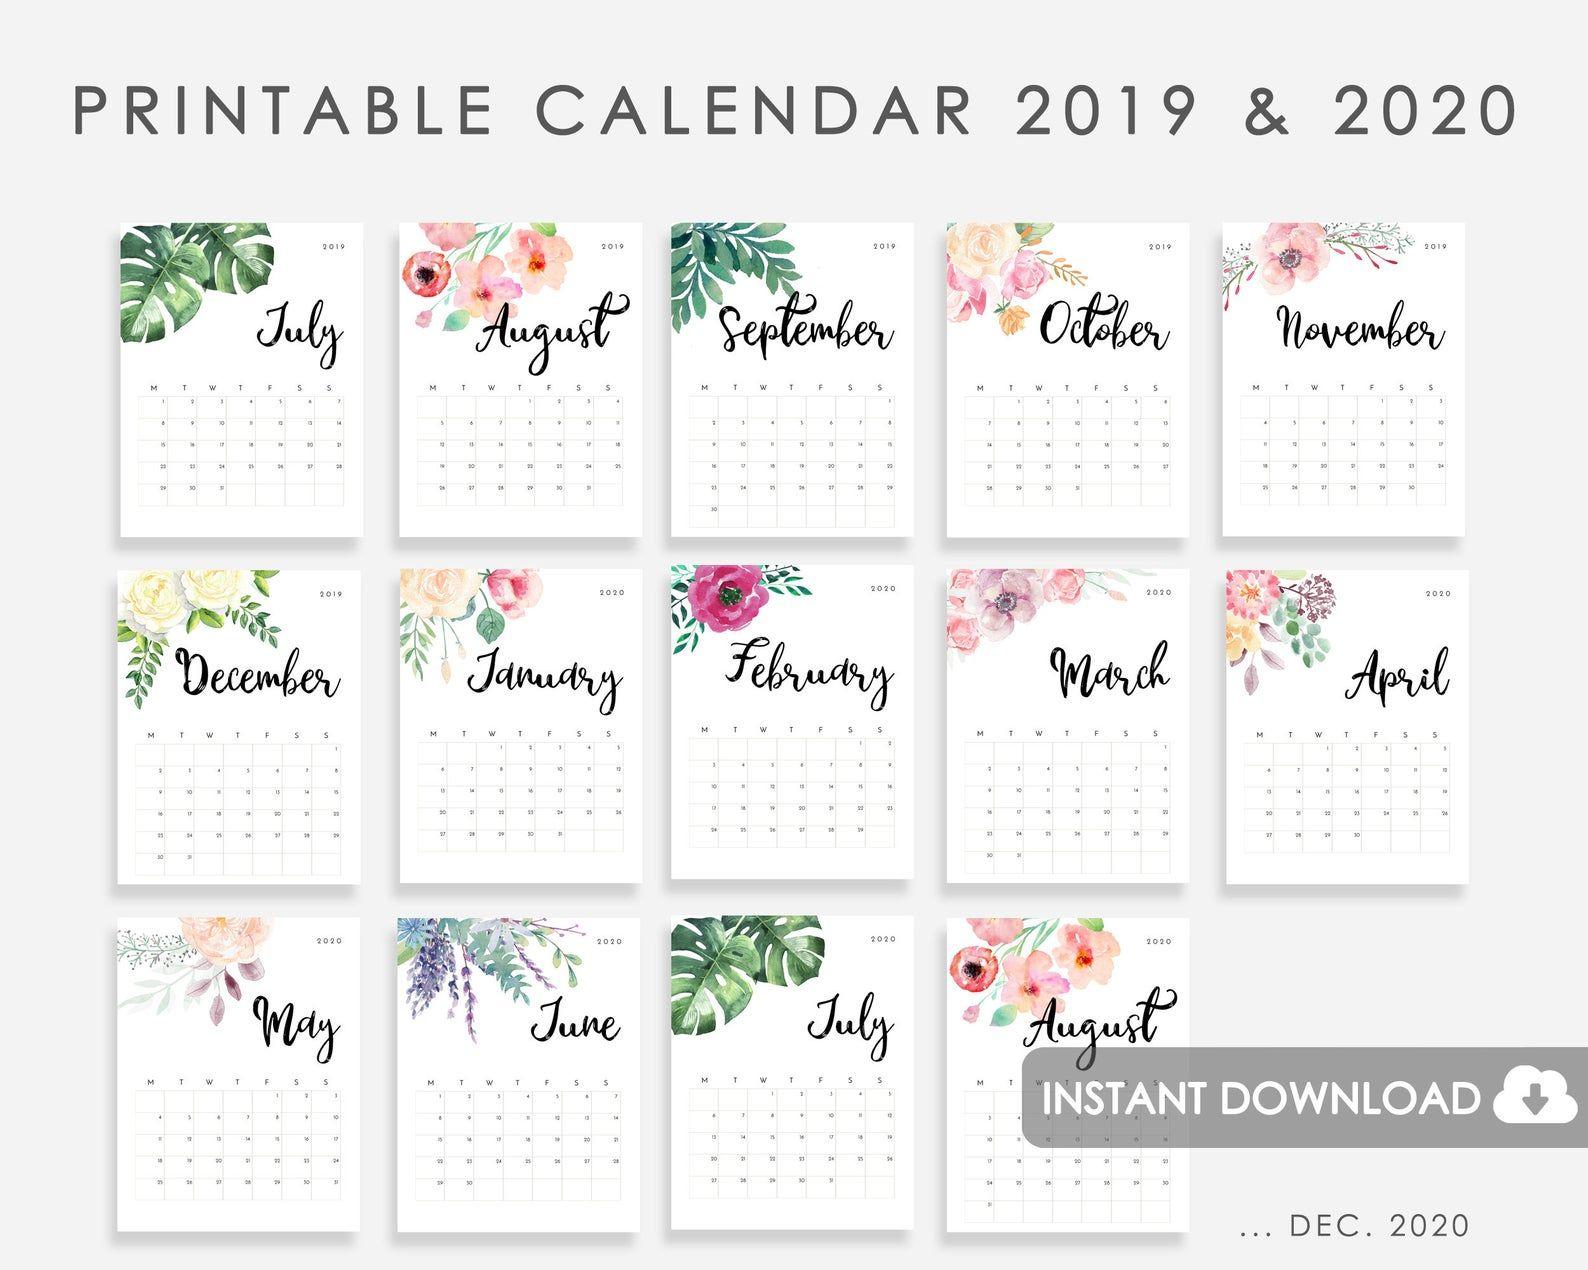 Calendar 20192020 Printable, Calendar Watercolor Flowers with regard to Printable Disney Calendar 2020